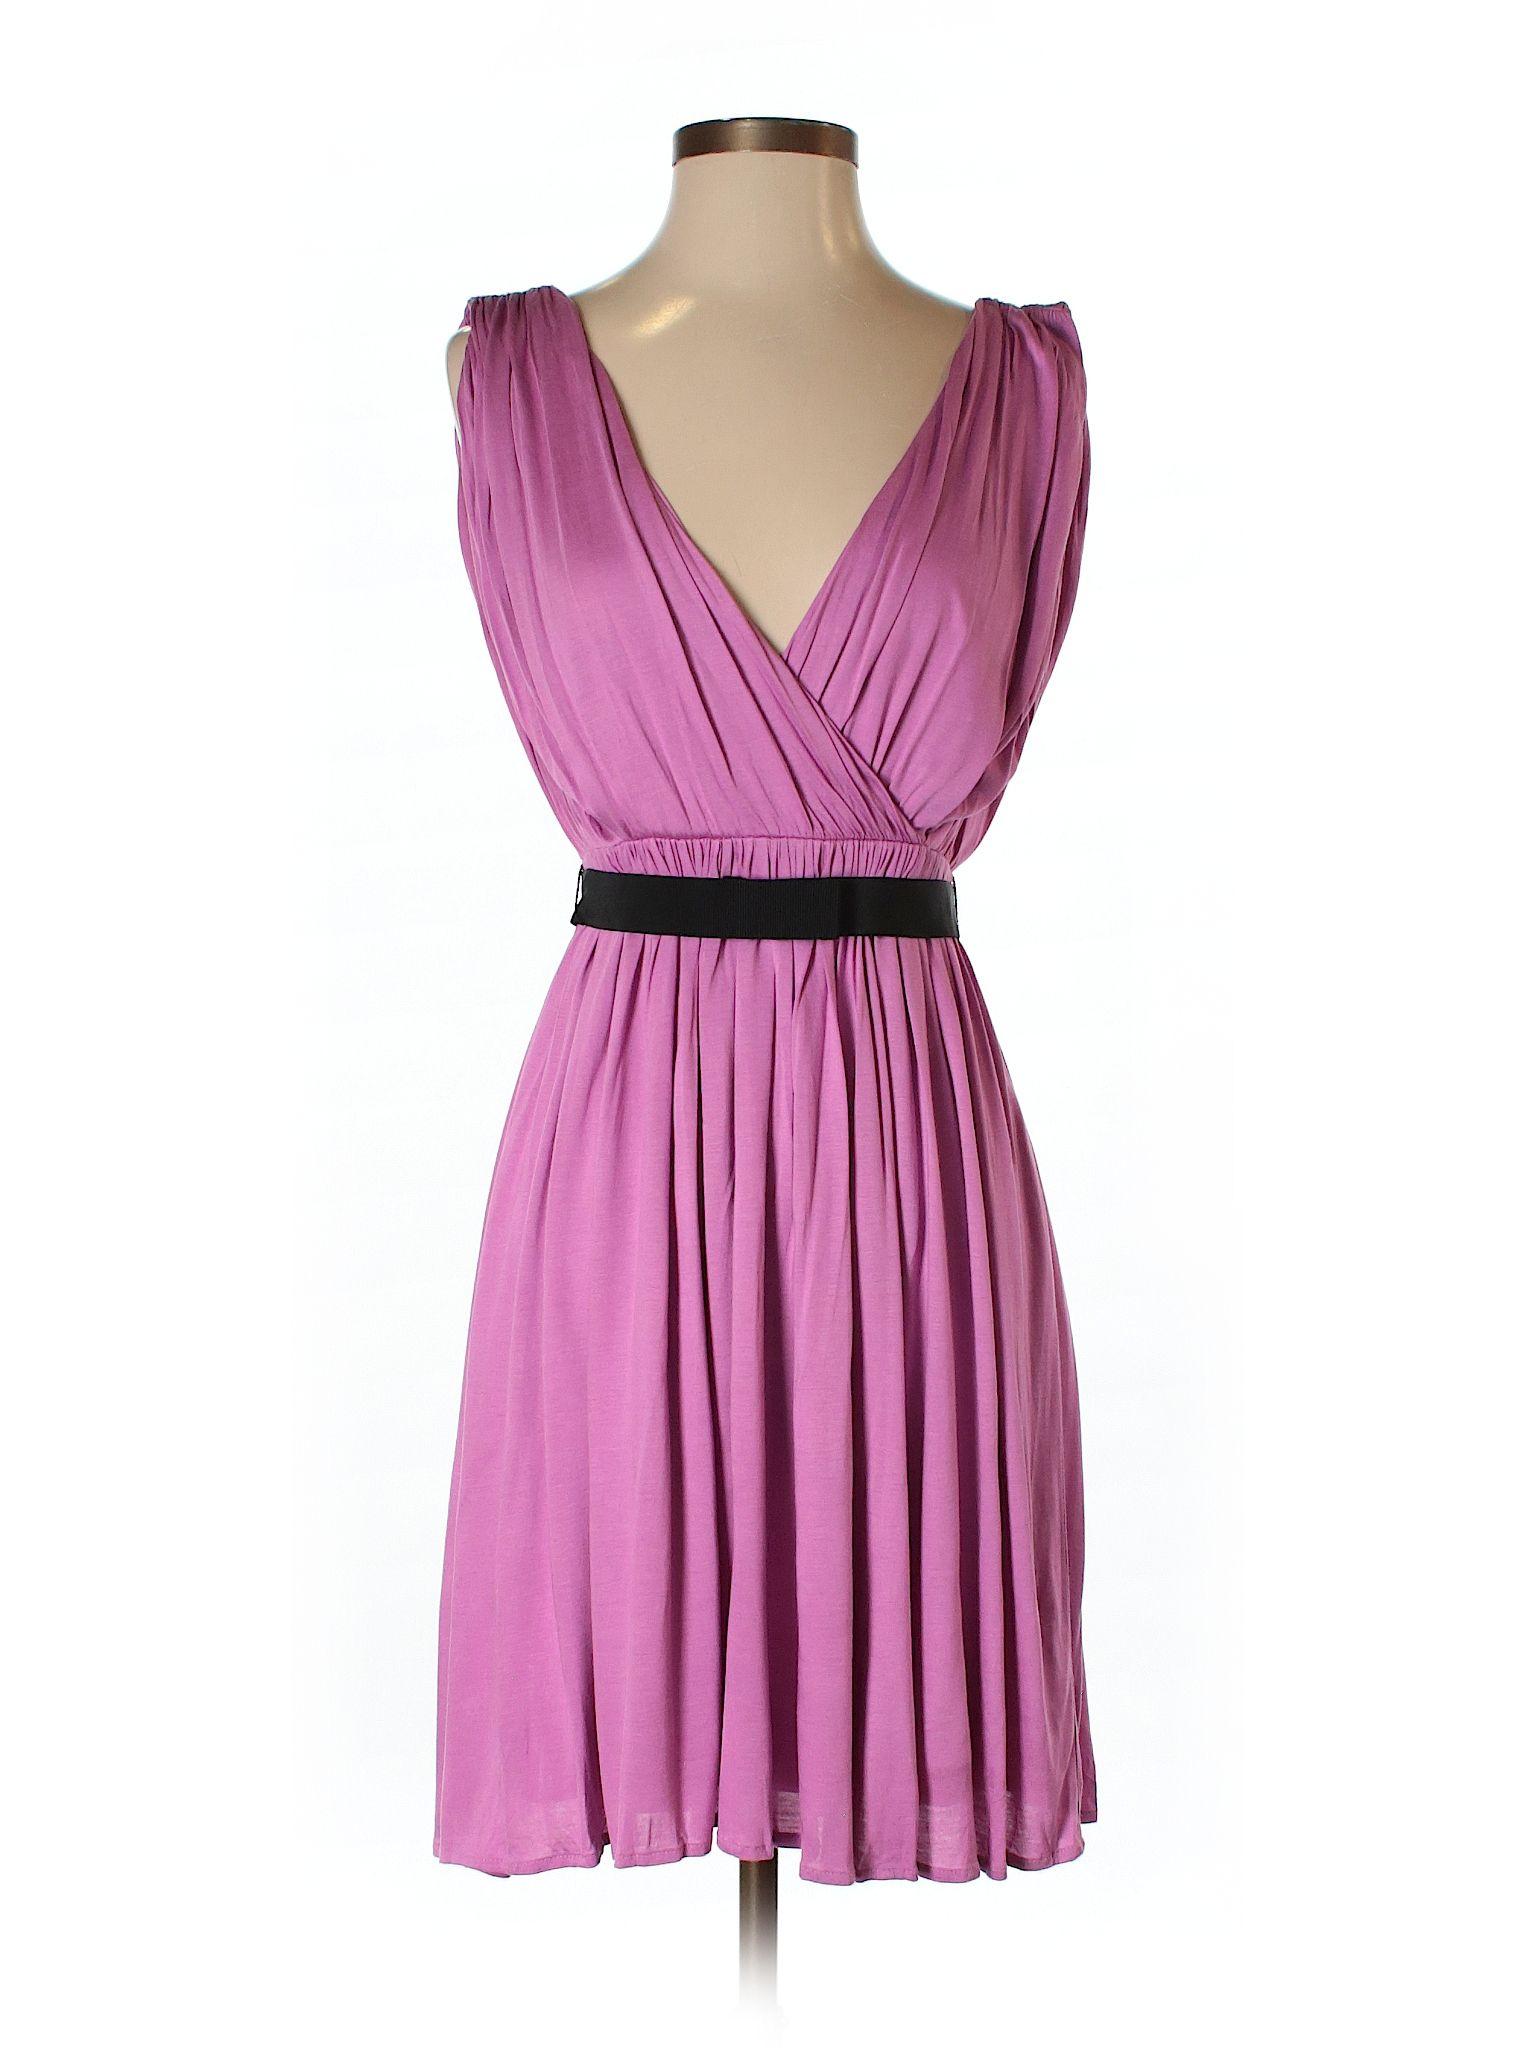 Ann Taylor LOFT Casual Dress: Size 0.00 Purple Women\'s Dresses - $21.99